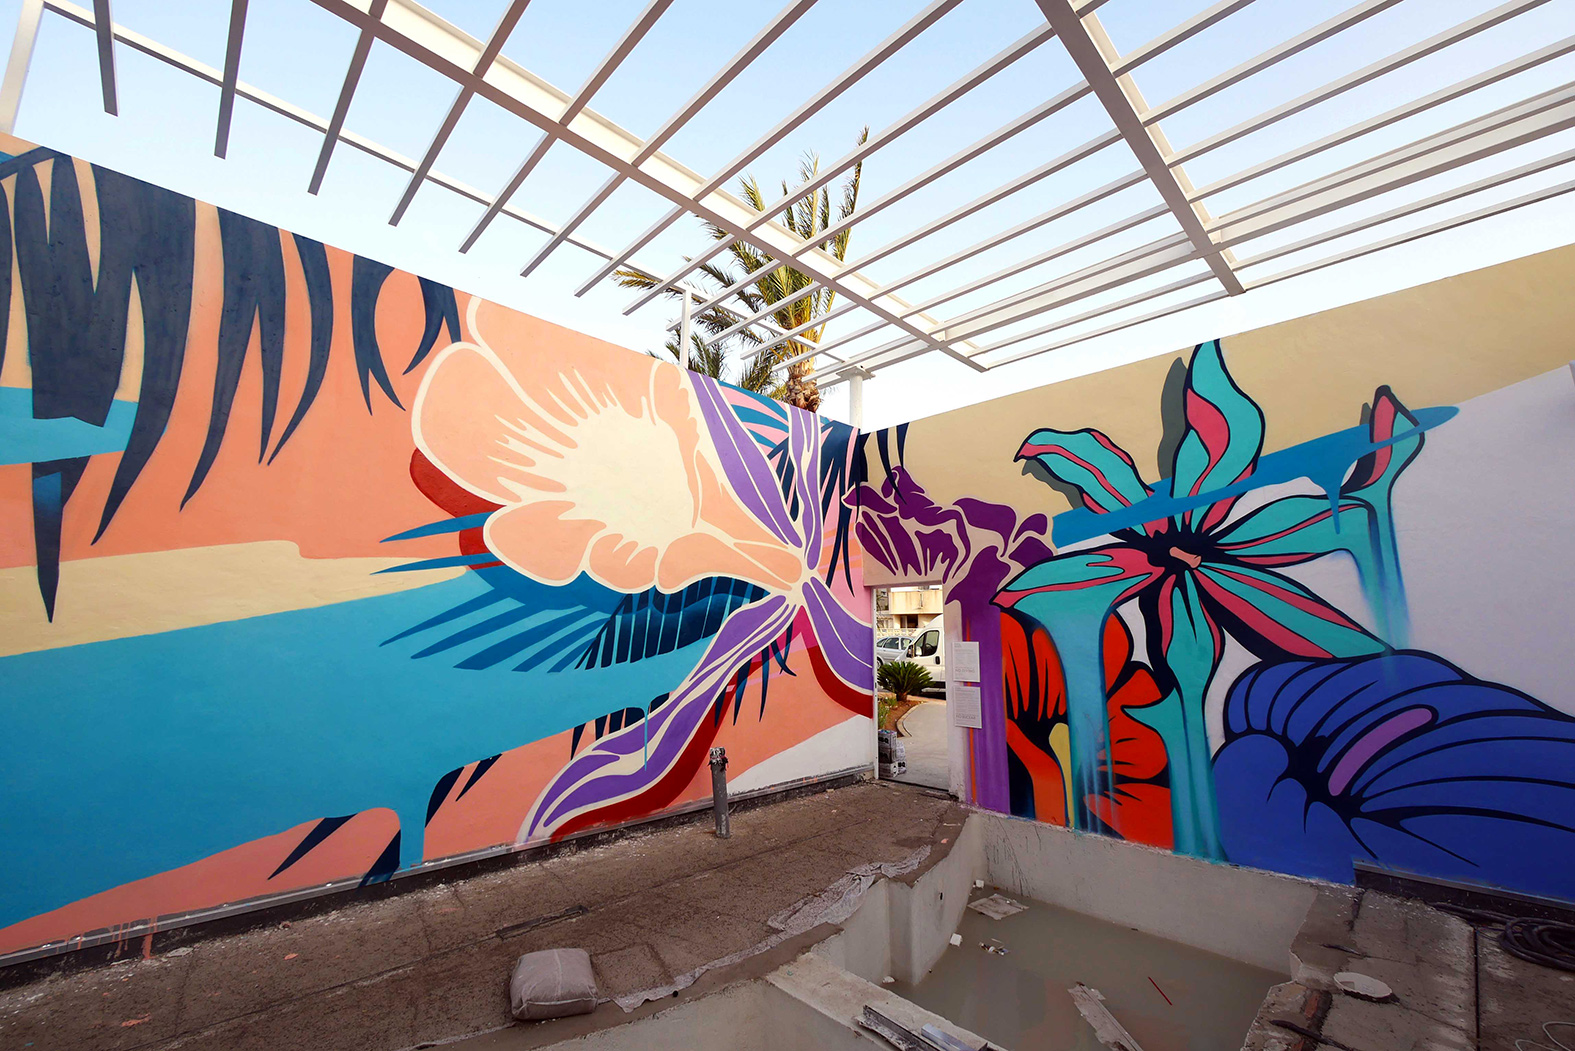 Nerone-W-hotel-painting-street-art-ibiza-22